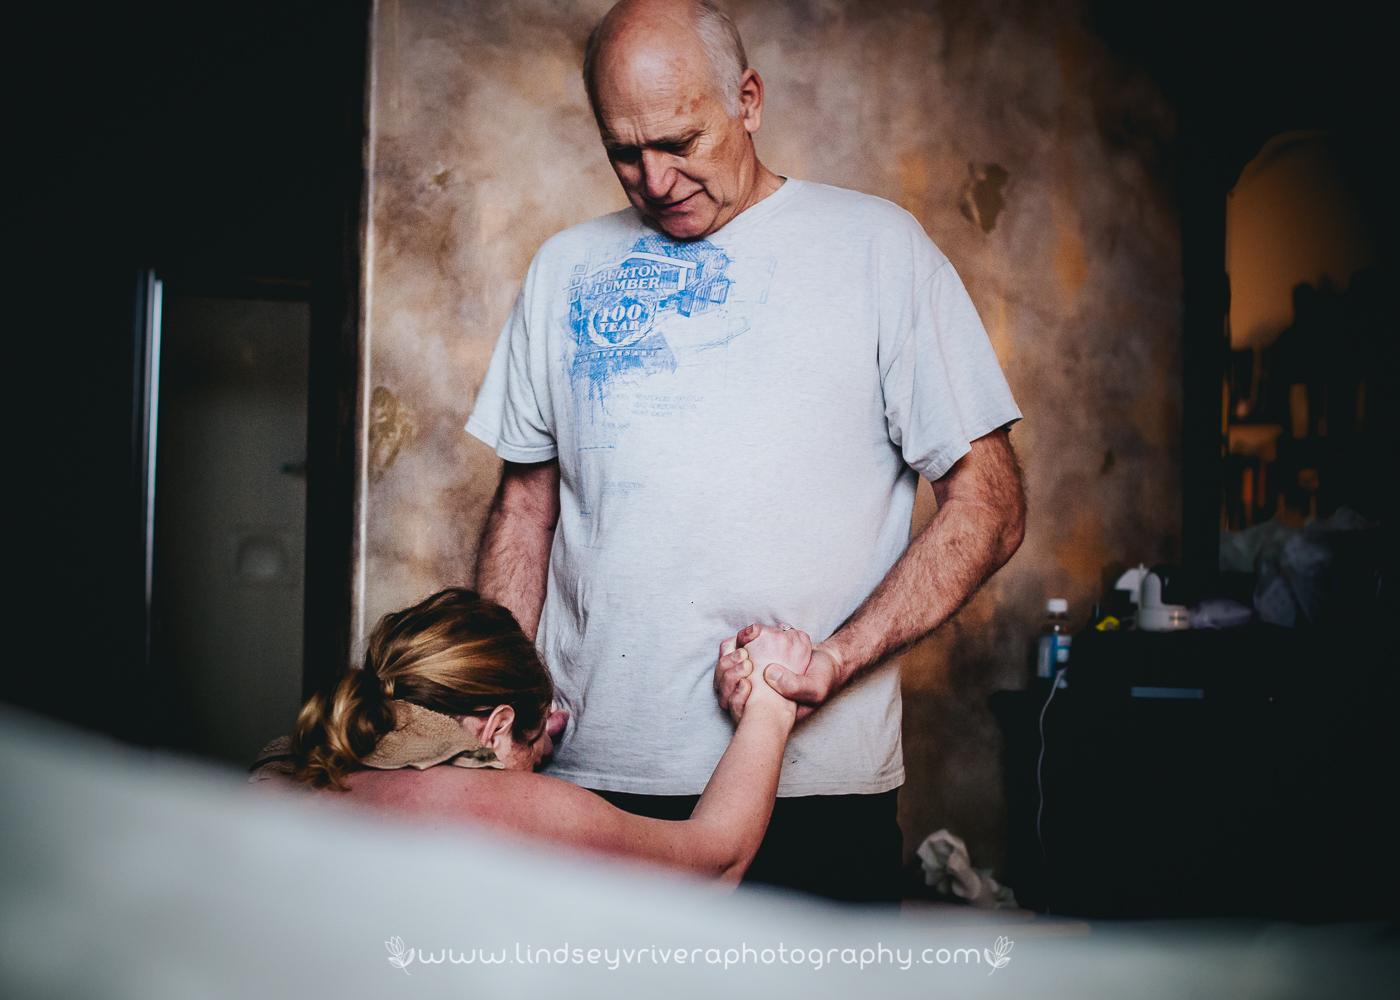 Home-Birth-Born-Photography-Salt-Lake-City,-Wasatch-Midwifery-&-Wellness,-Just-Born9.jpg